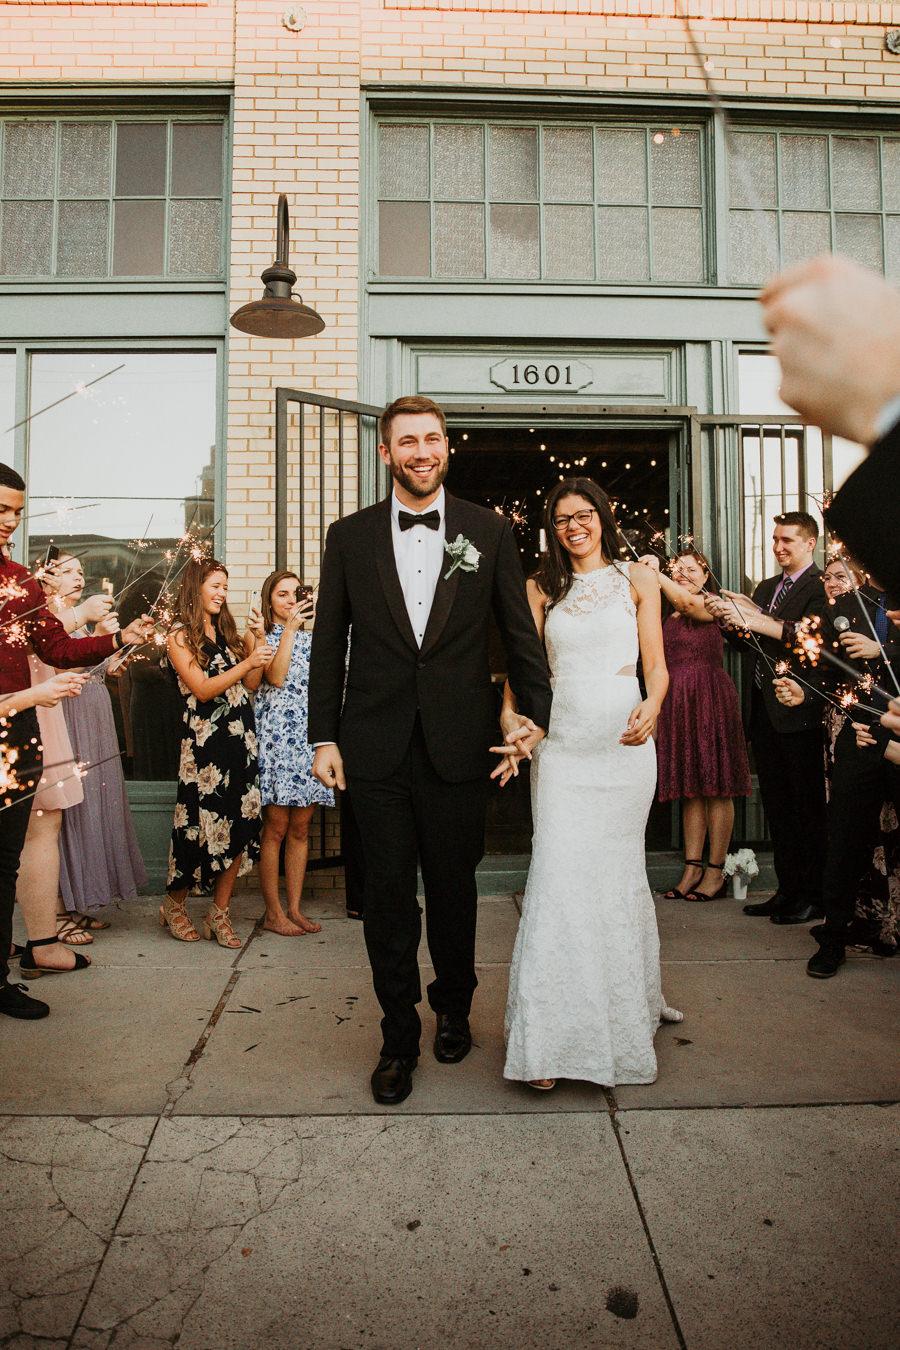 Tampa Heights Industrial Wedding at Cavu Emmy RJ-191.jpg